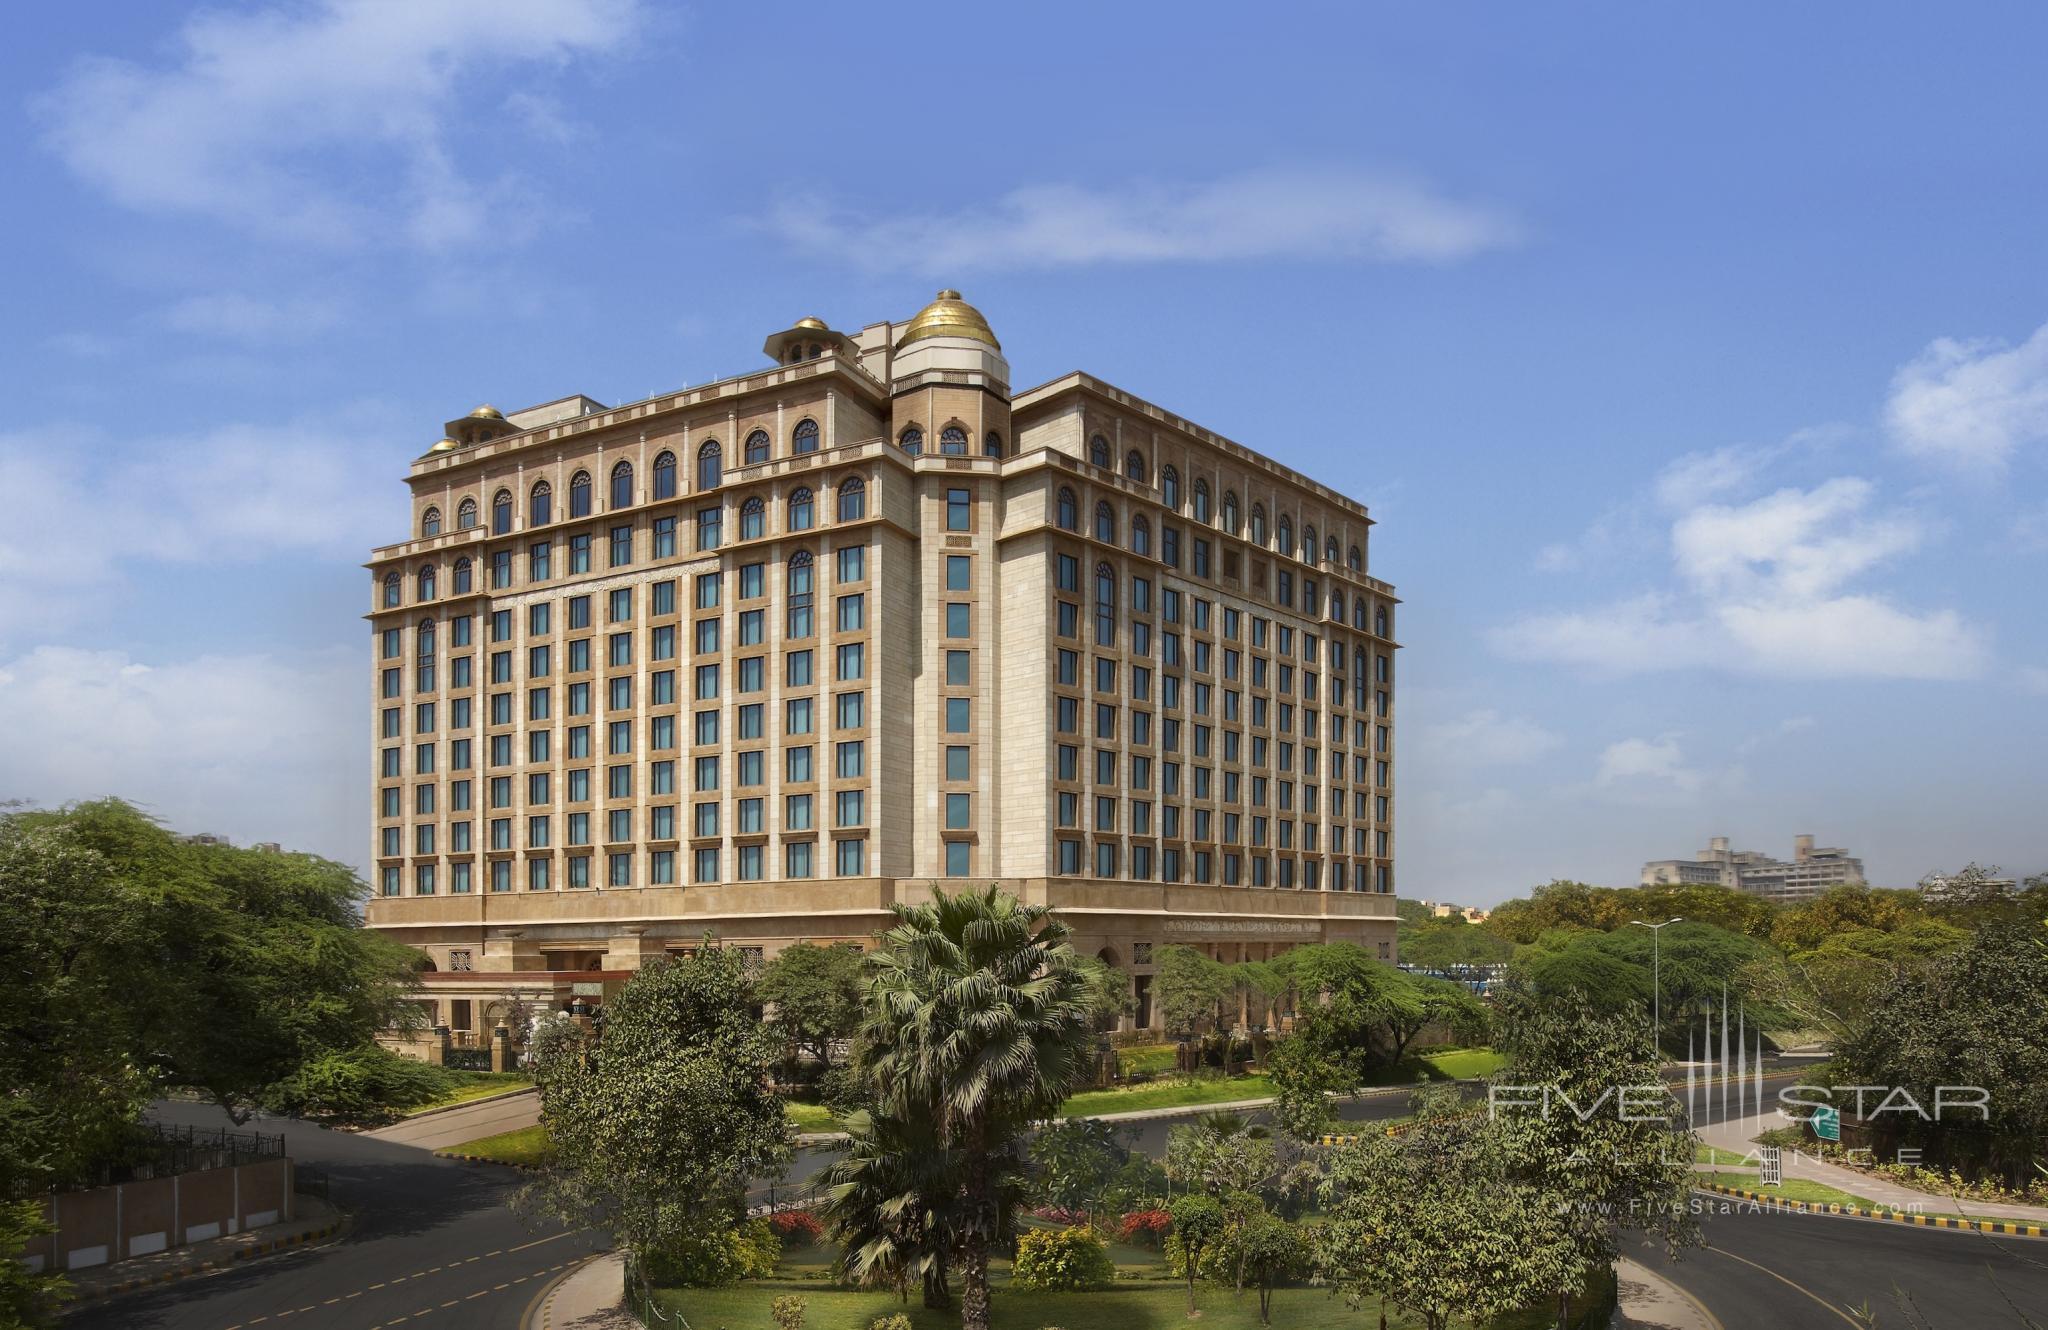 Leela Palace New Delhi